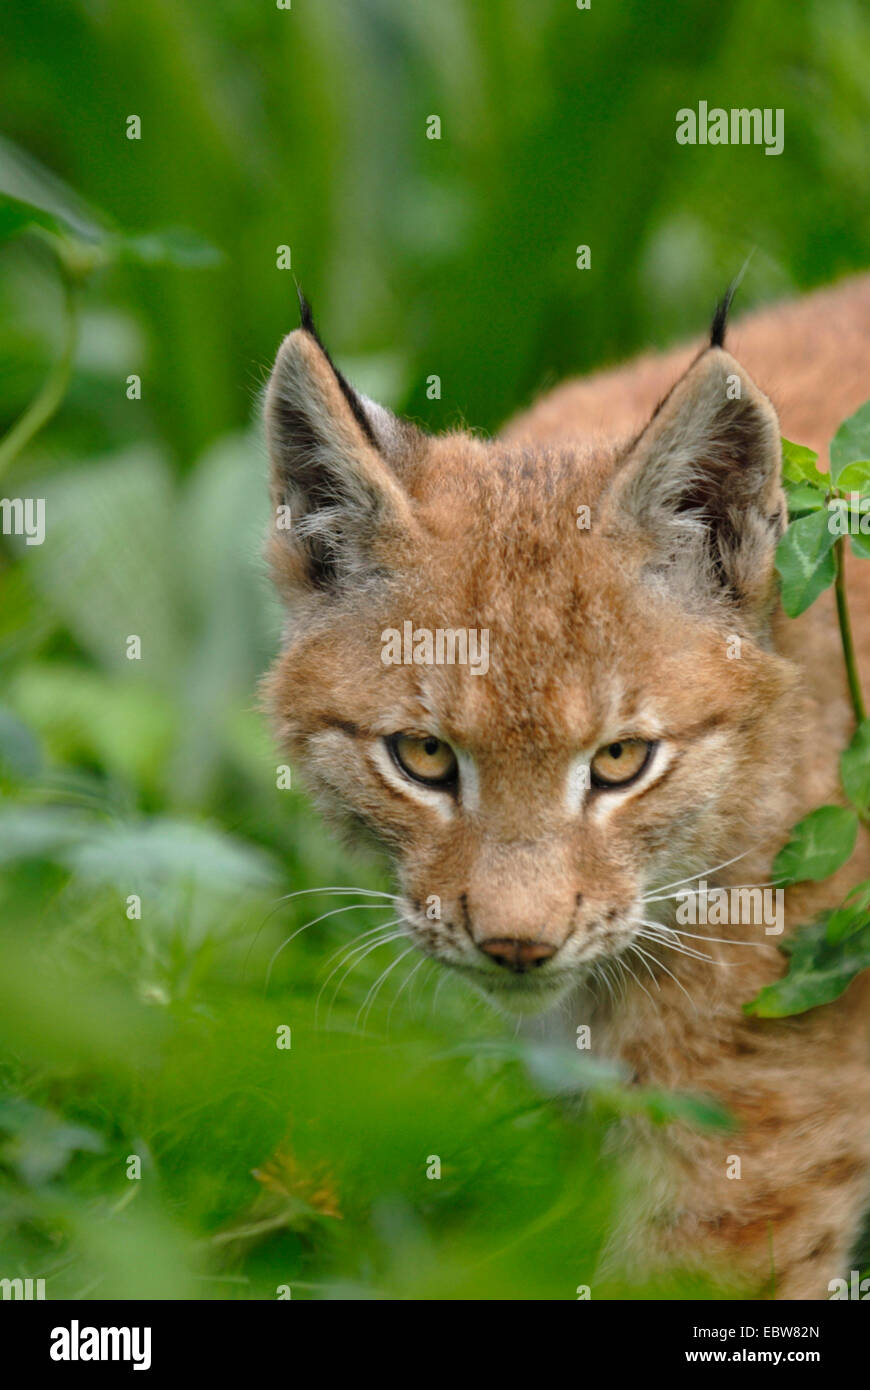 Eurasian lynx (Lynx lynx), pup watching distrustful into the camera - Stock Image